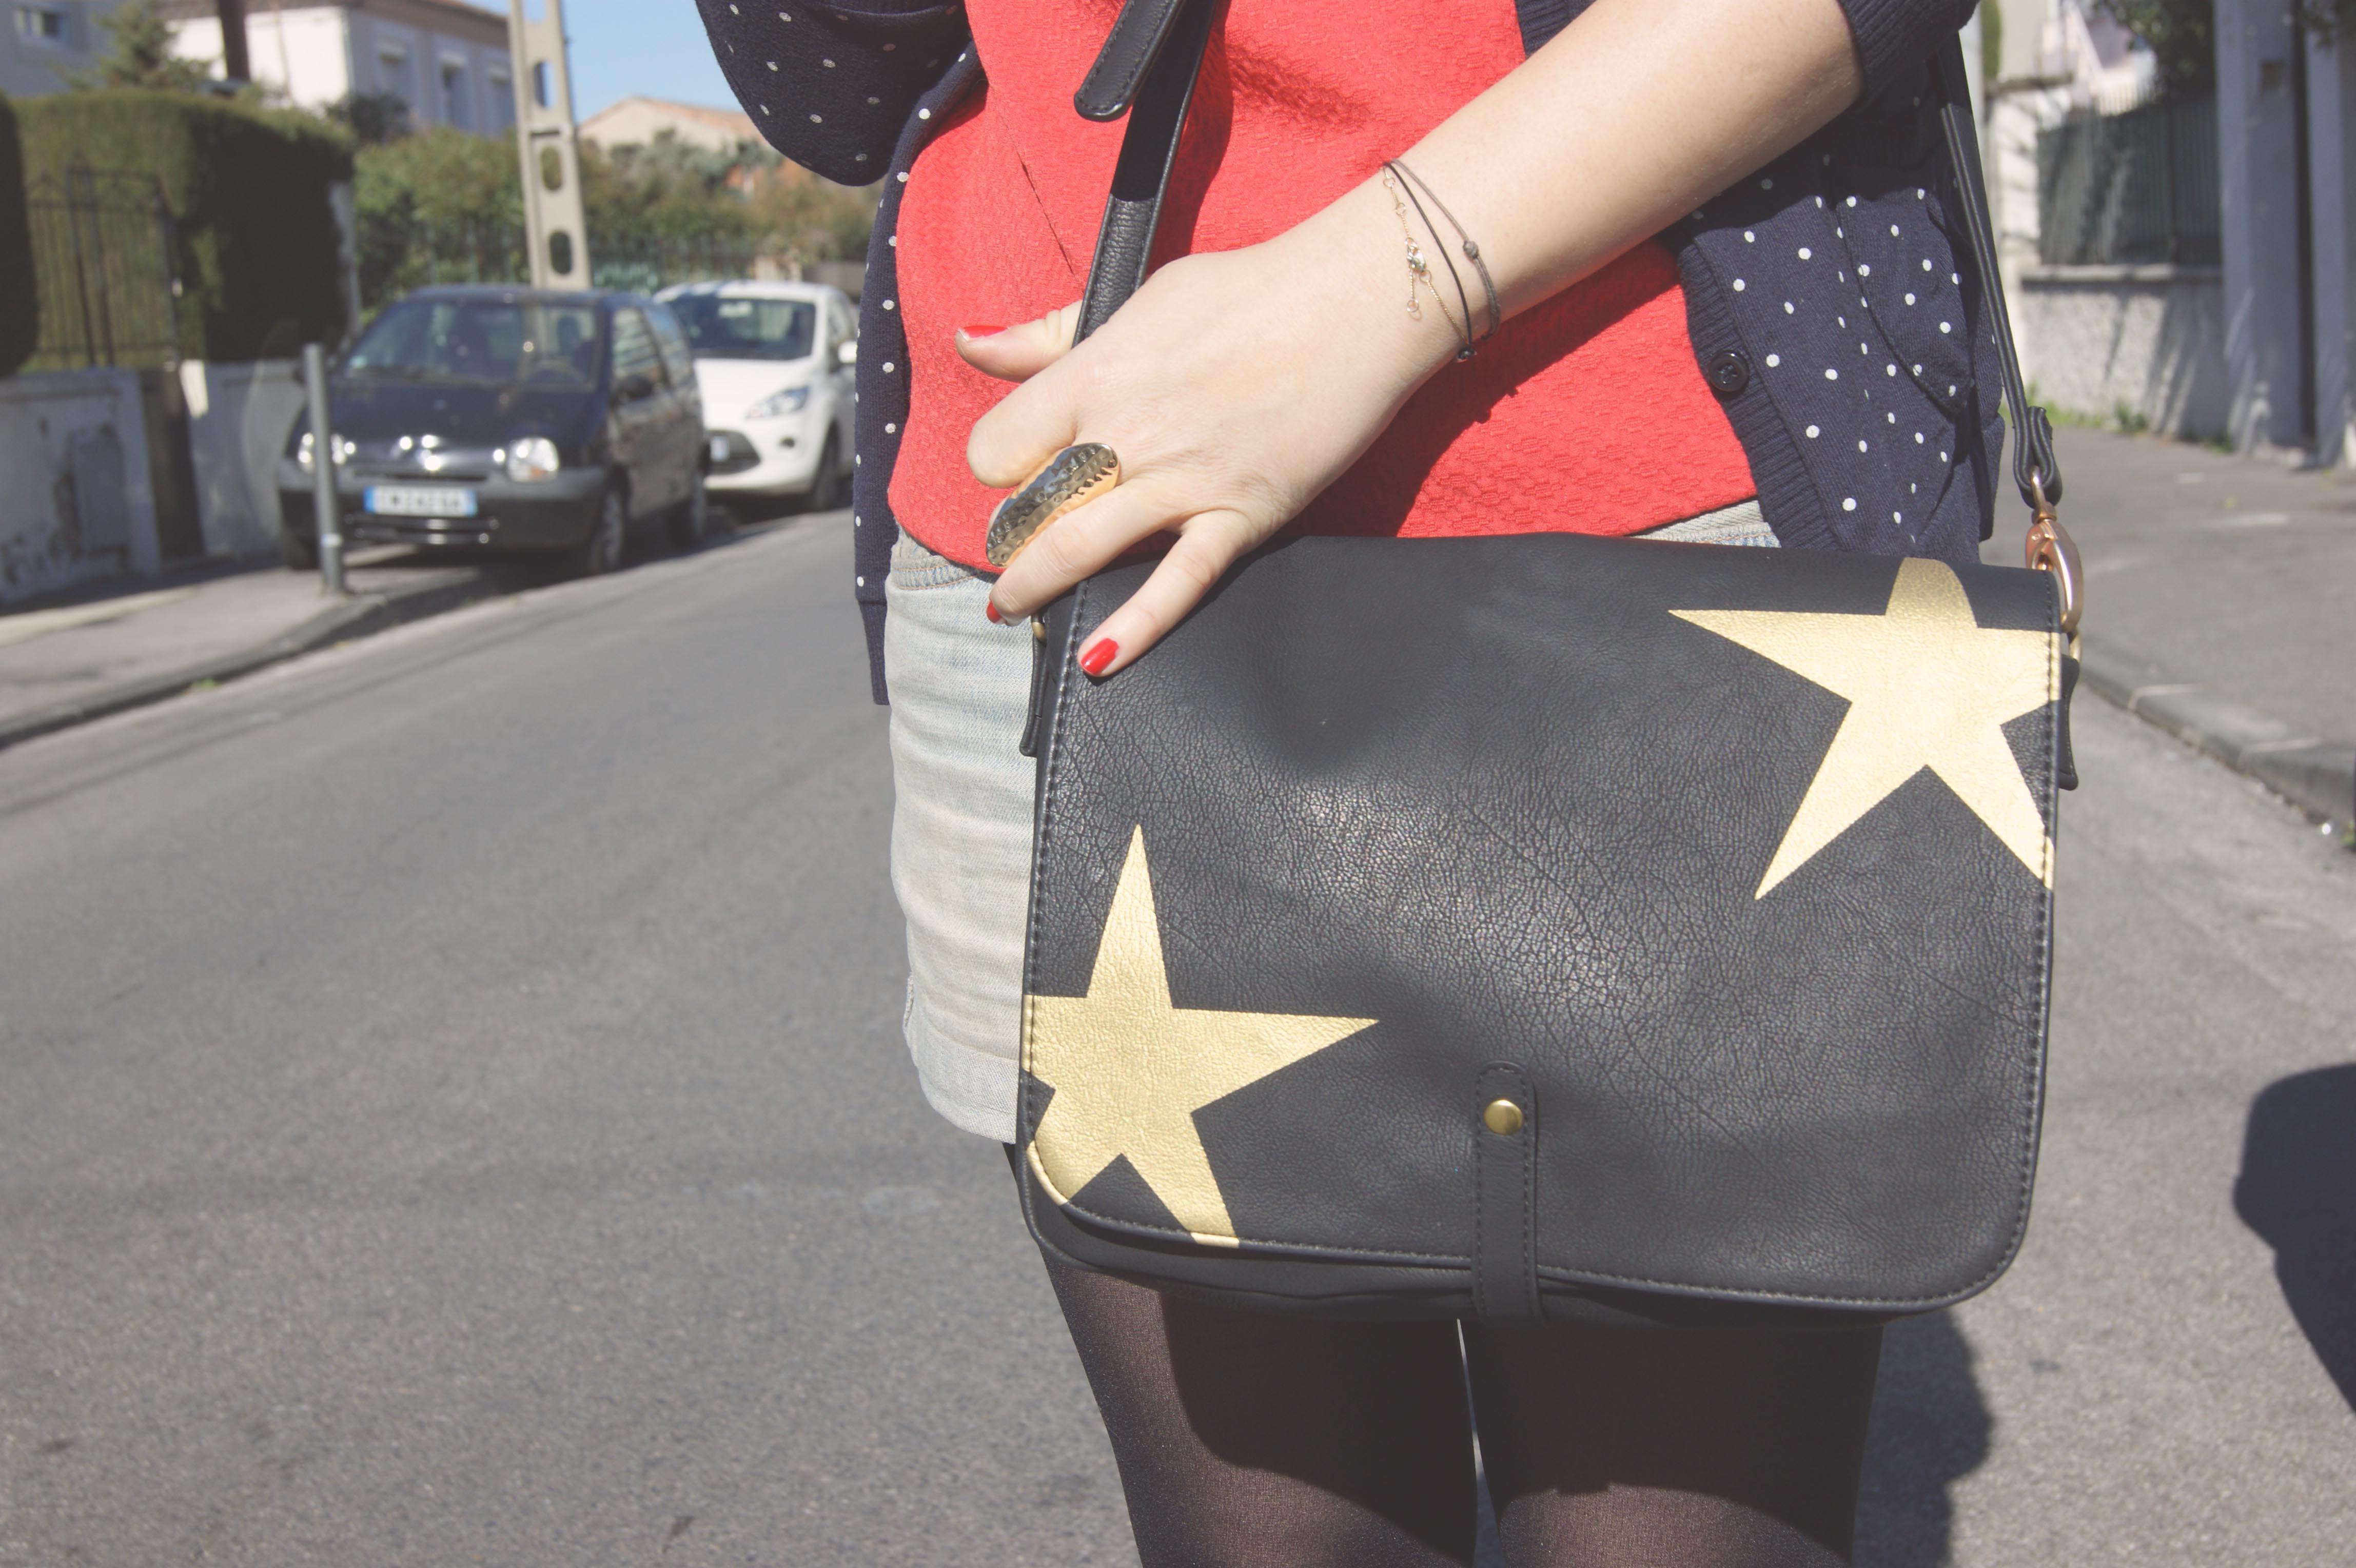 sac étoiles naf naf